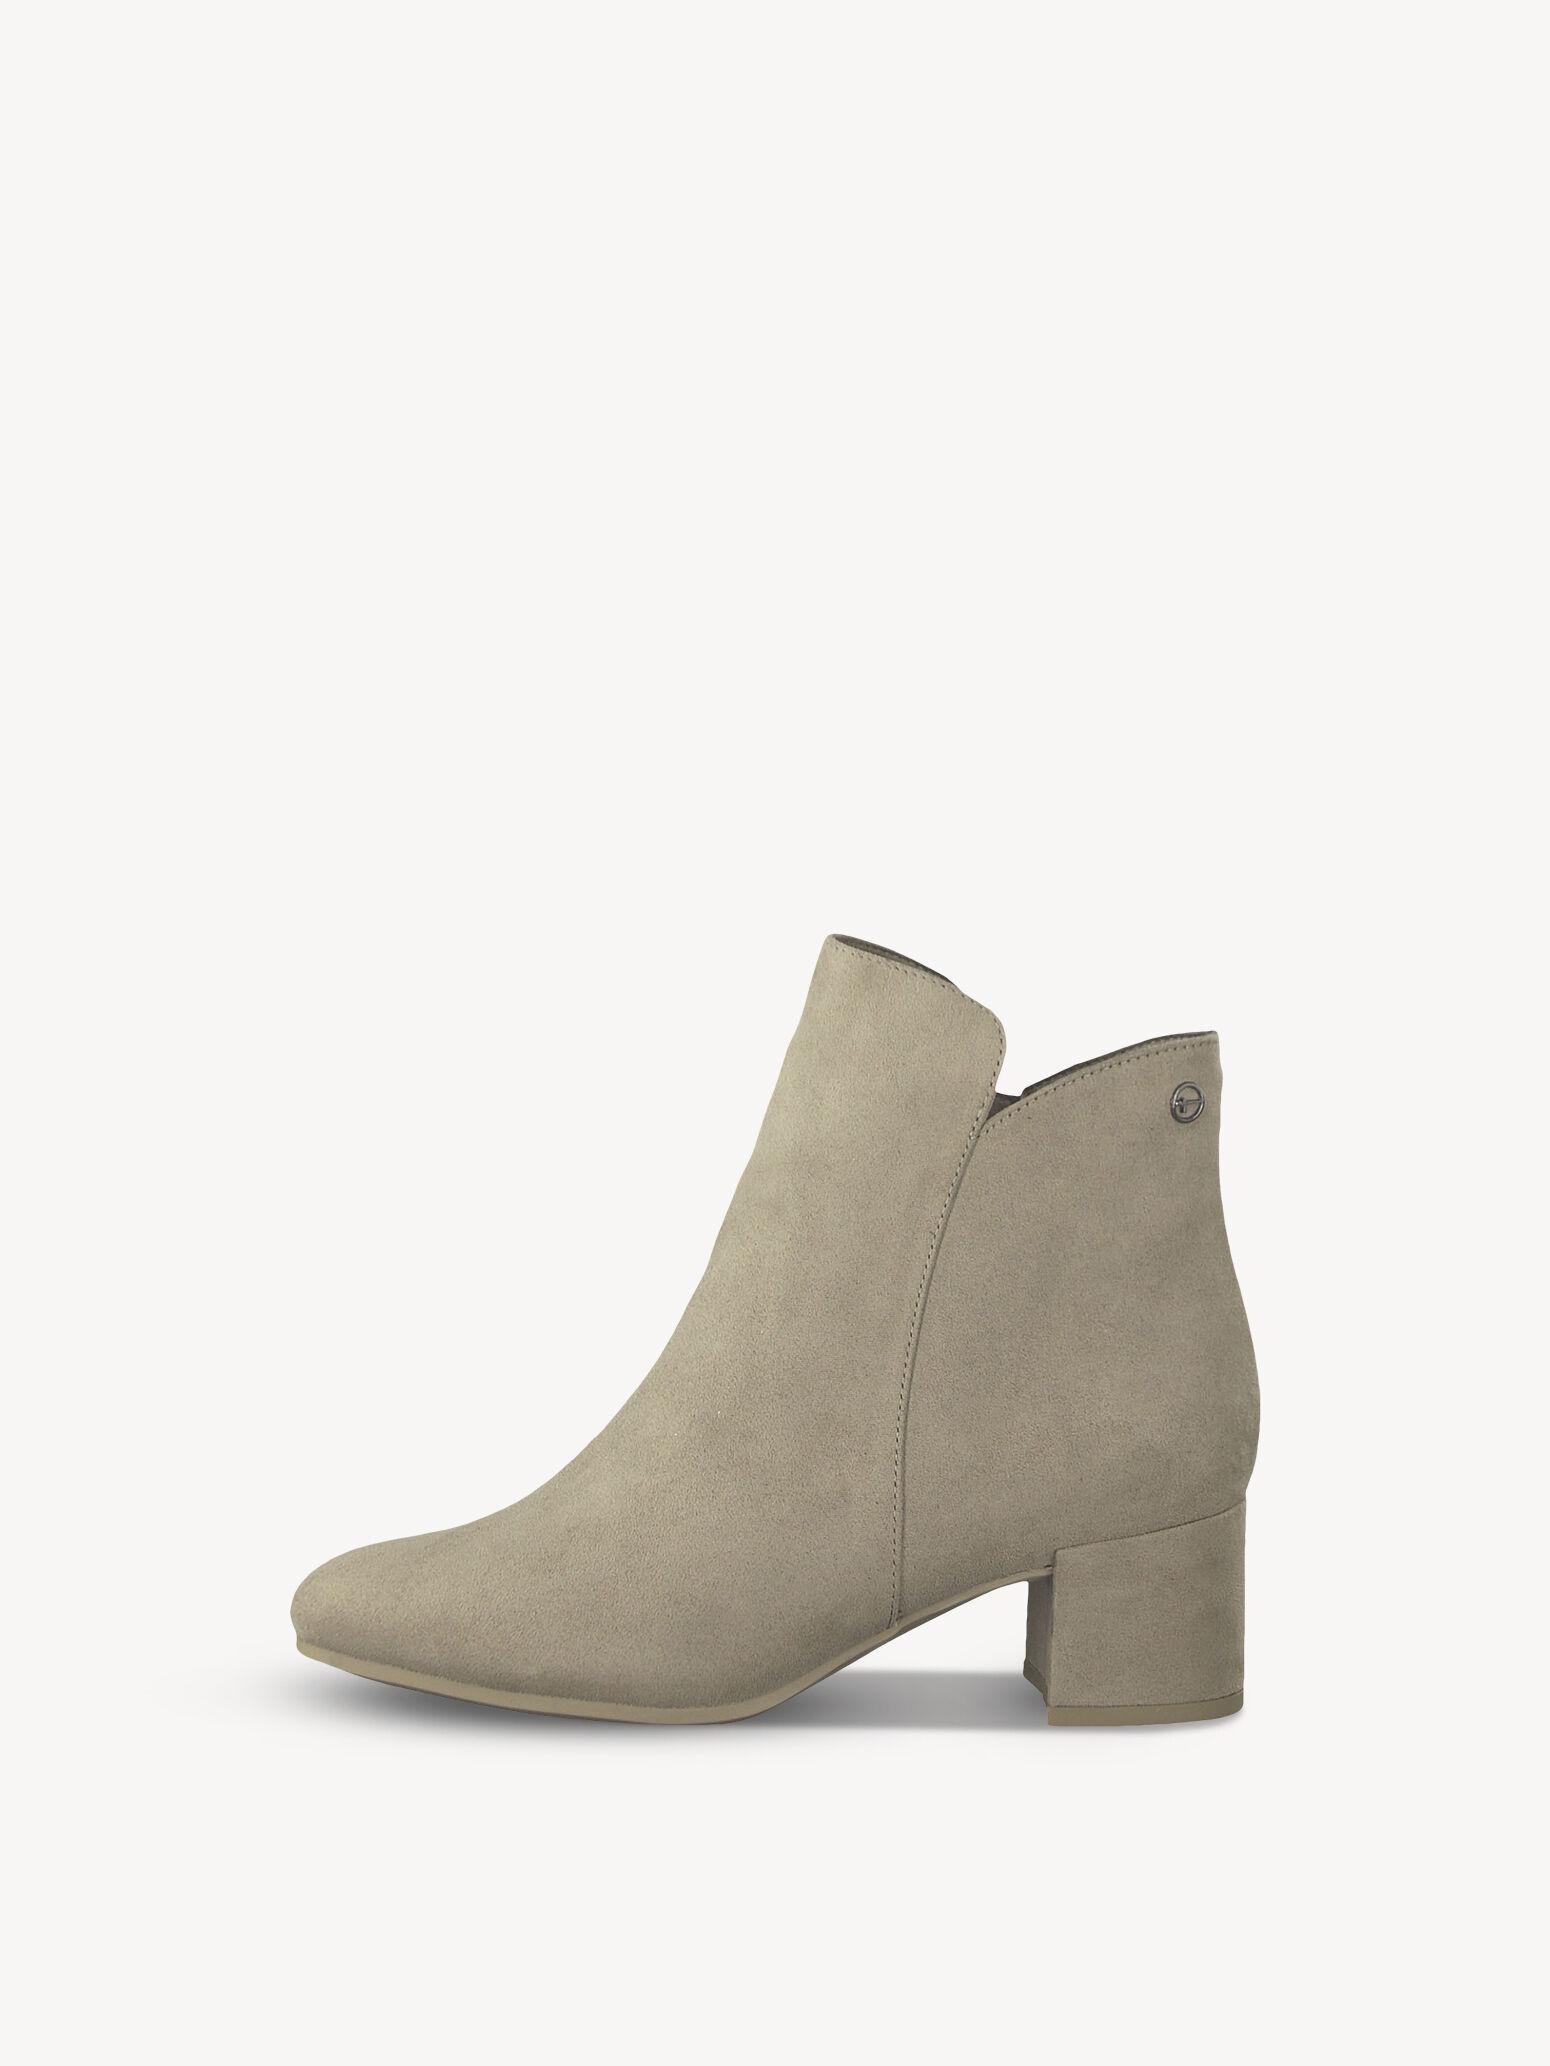 Beige En À Croûte Cuir Boots Femme De Talons wOkX8n0P